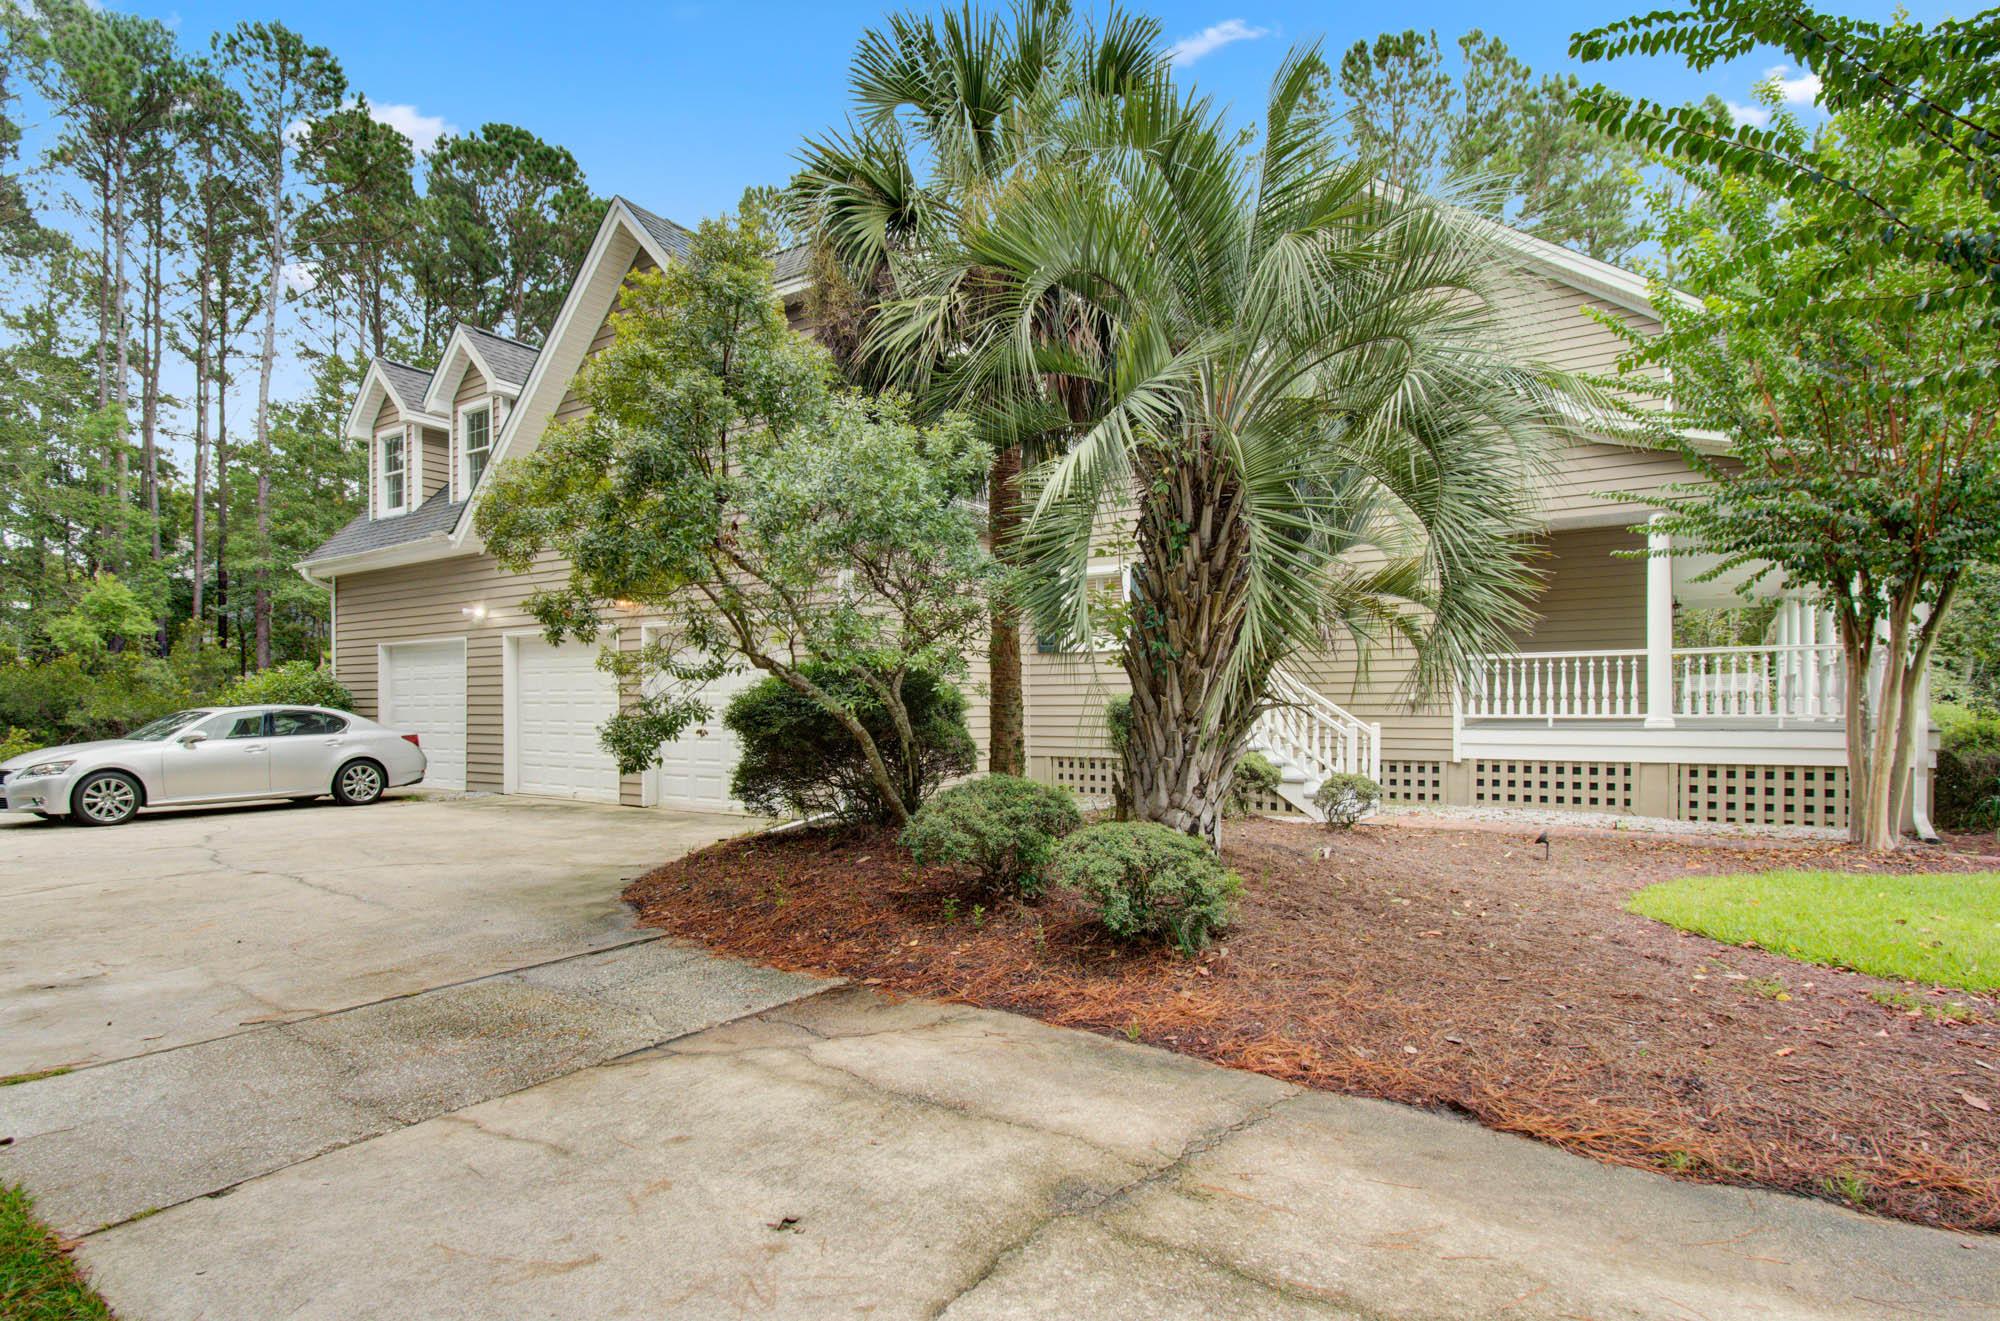 Dunes West Homes For Sale - 3515 Colonel Vanderhorst, Mount Pleasant, SC - 11